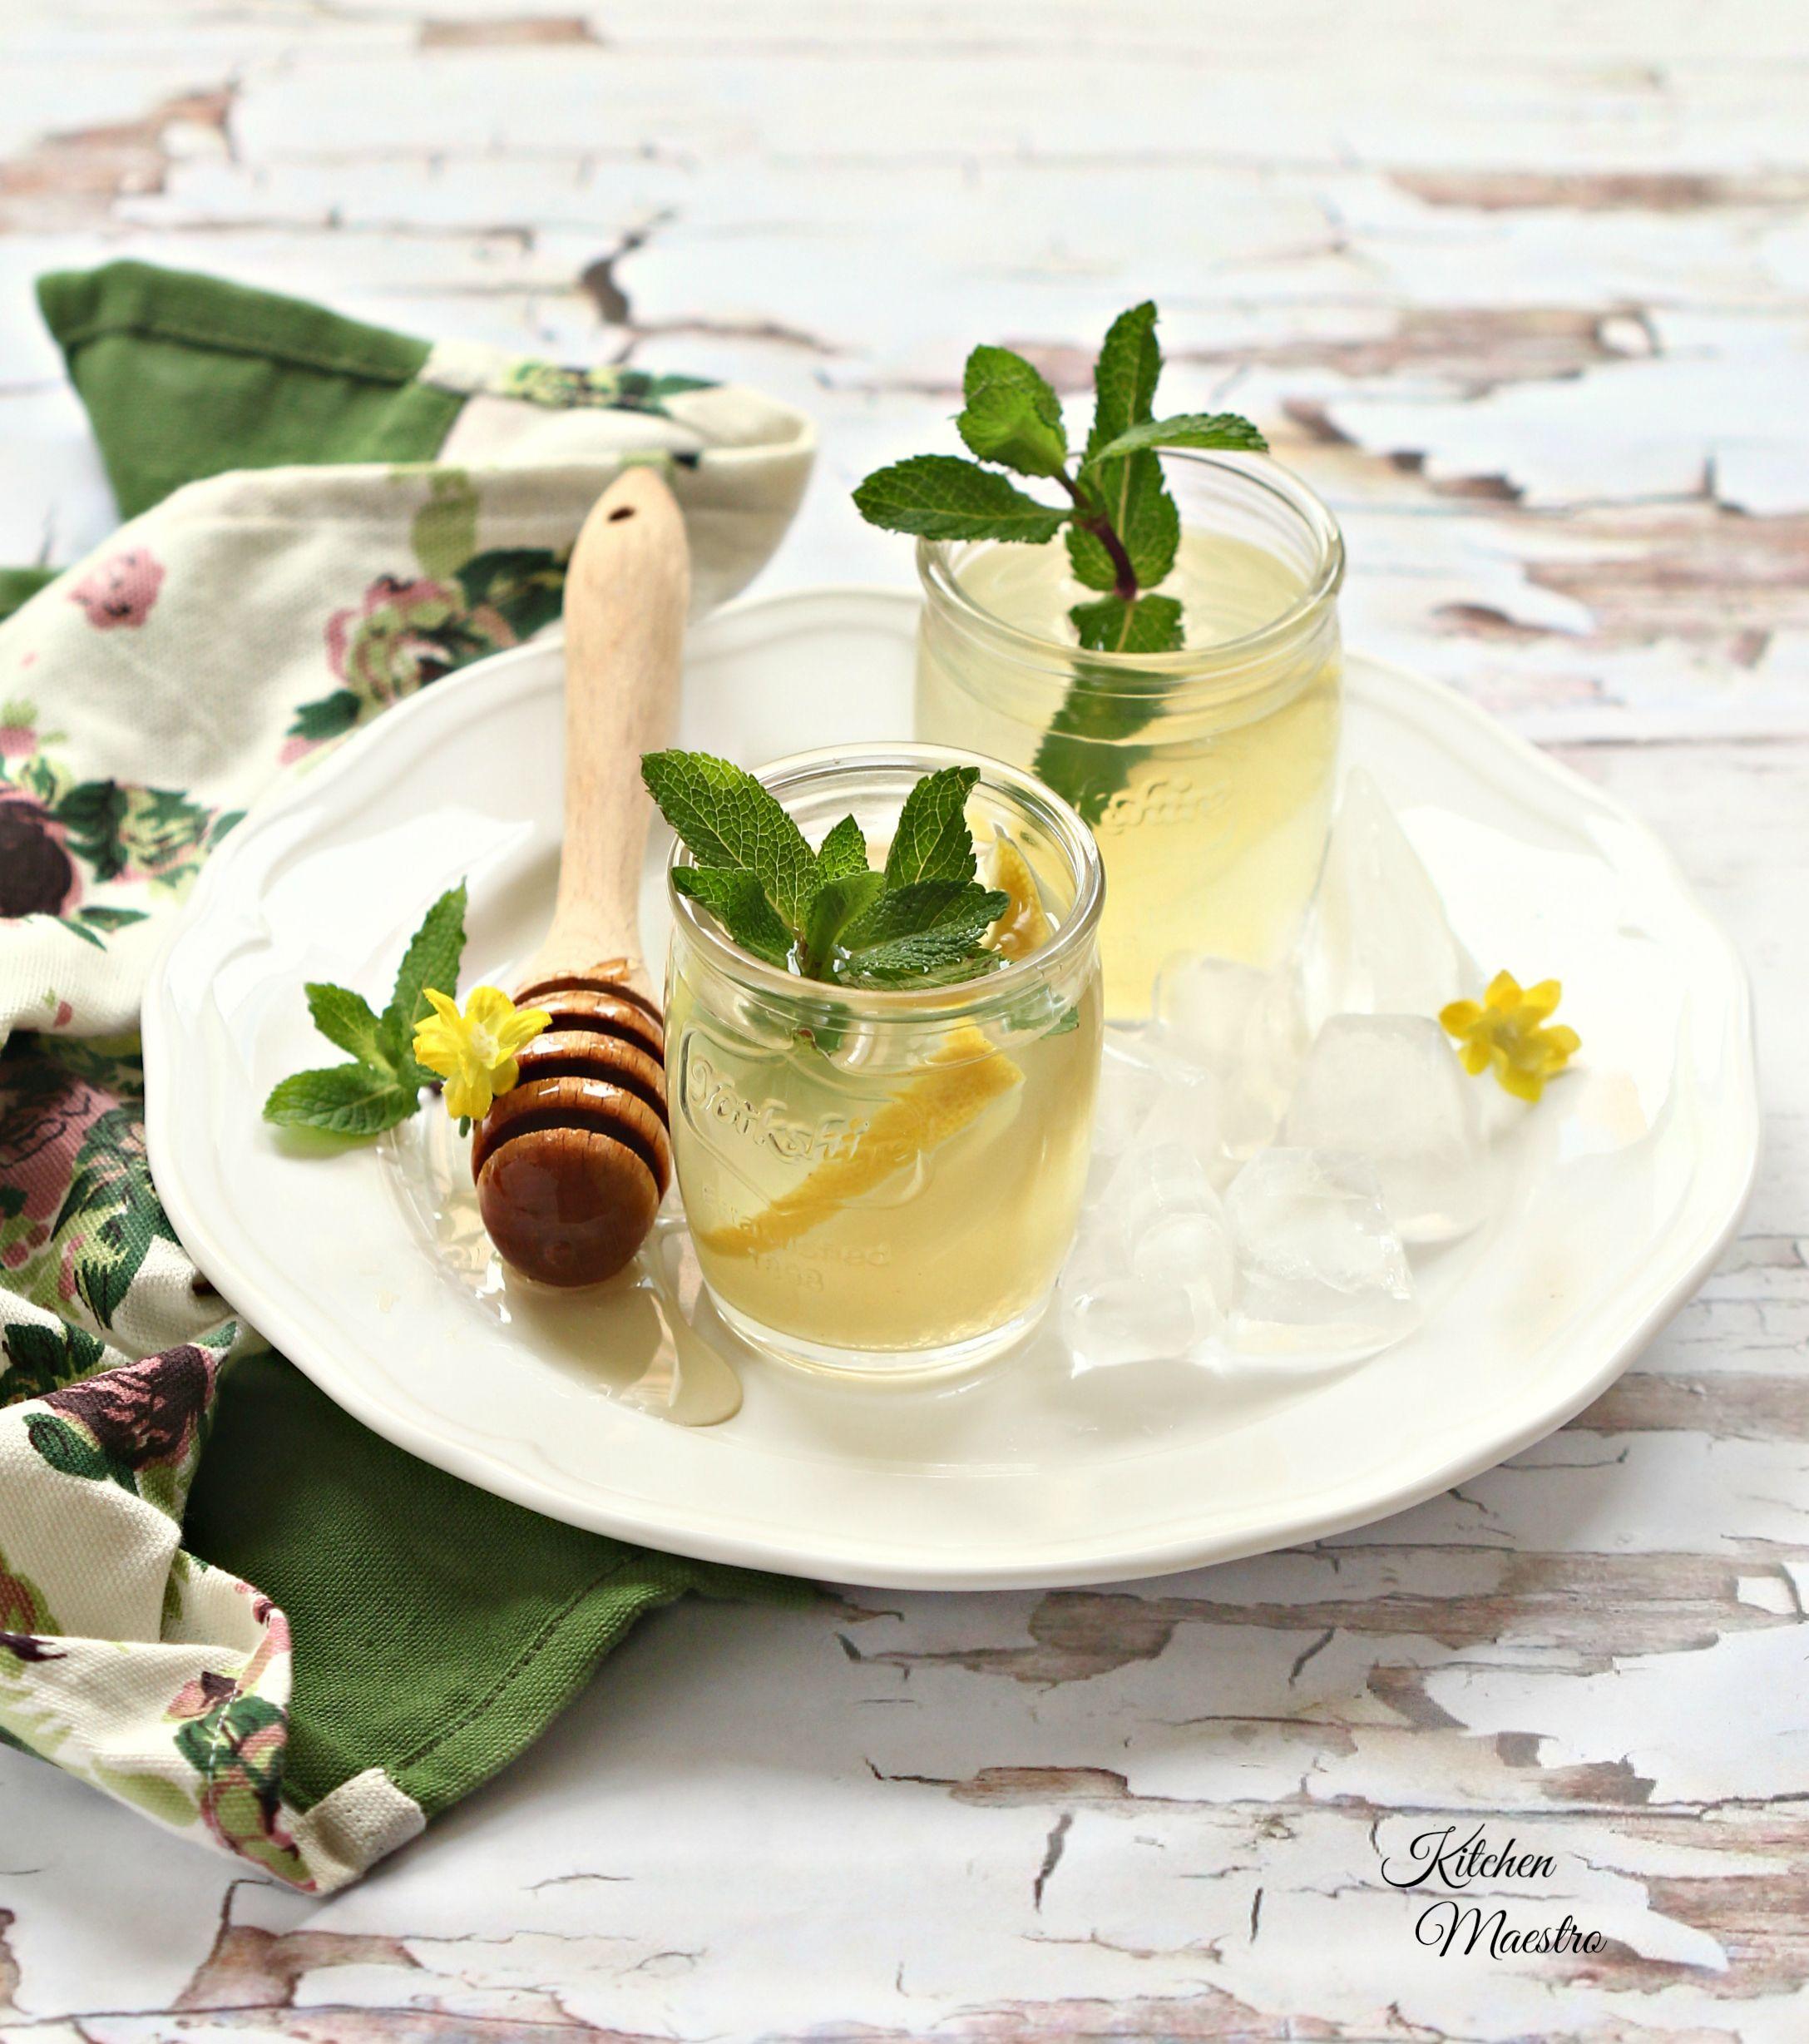 Kitchenmaestro Aboutme Mint Lemonade Lemonade Honey Lemonade